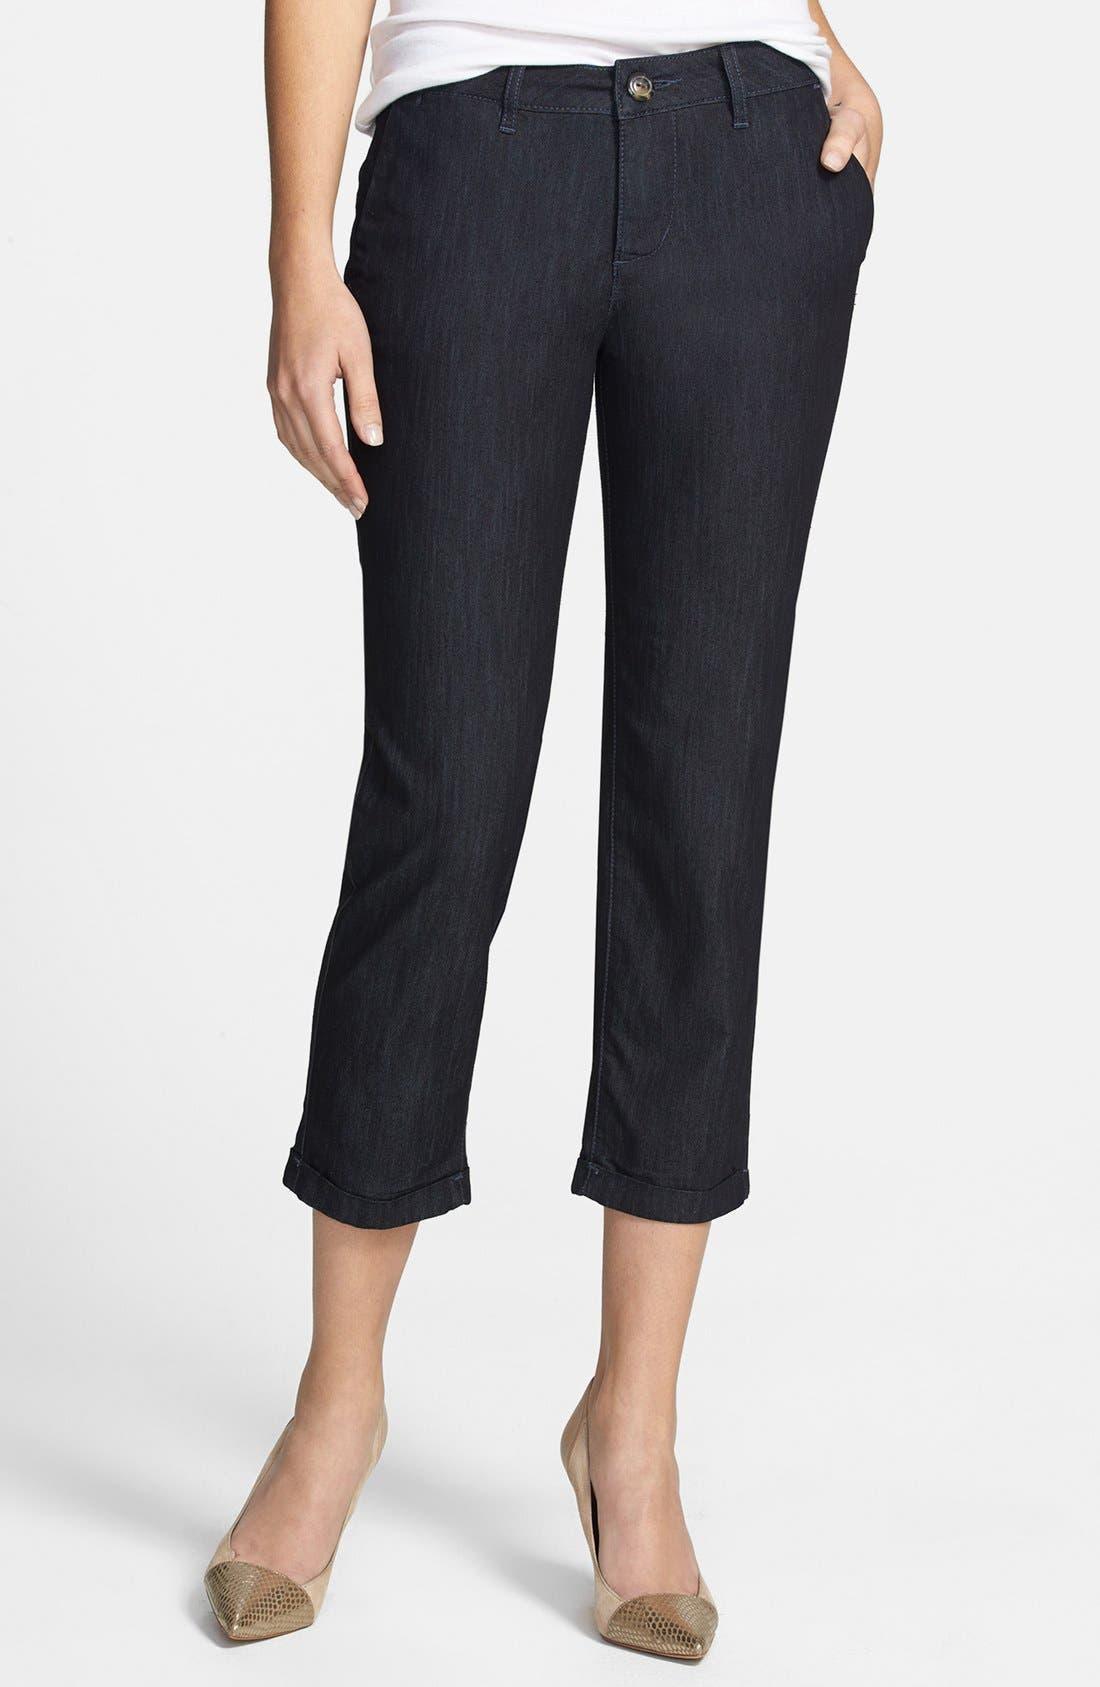 Main Image - Jag Jeans 'Cora' Stretch Crop Slim Leg Jeans (Dark Storm)